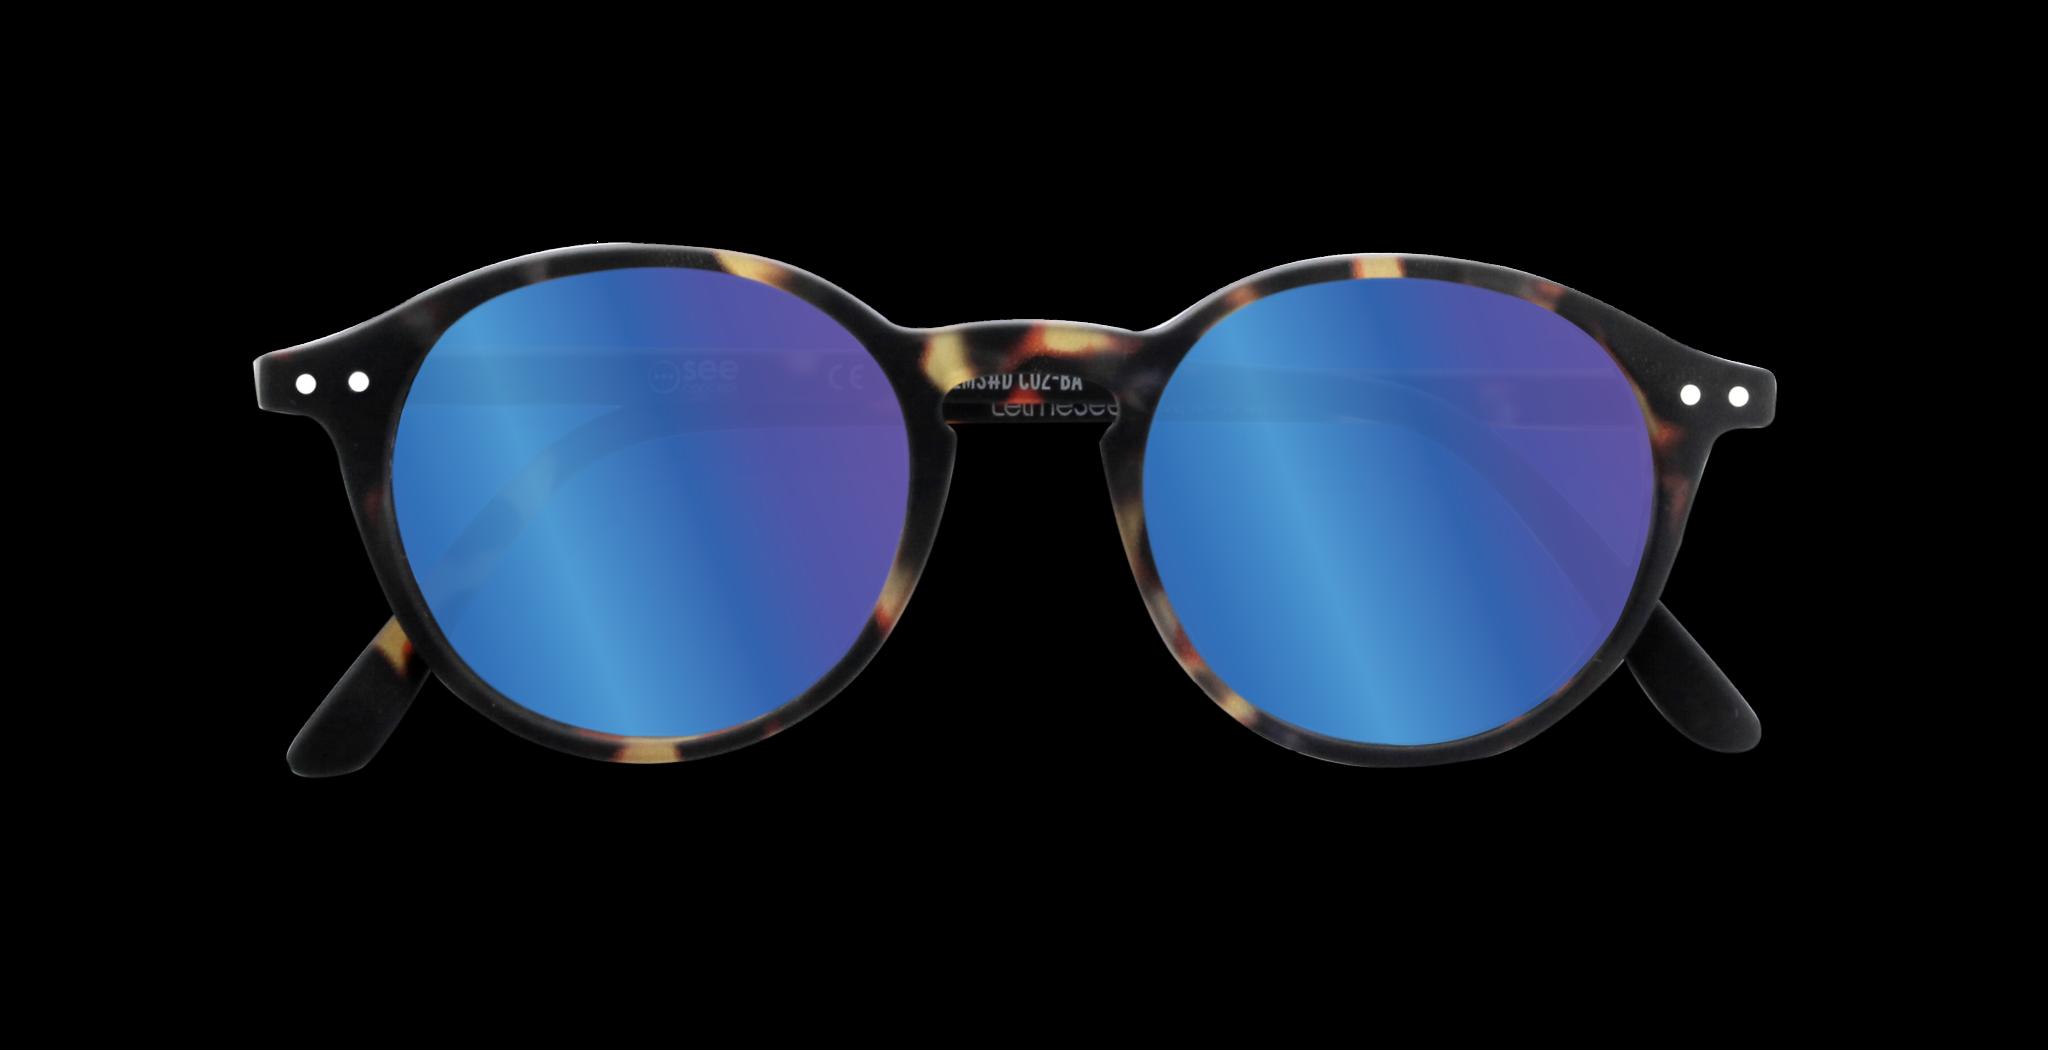 LetmeSee Sun C Sonnenbrille navy blue soft +0,0